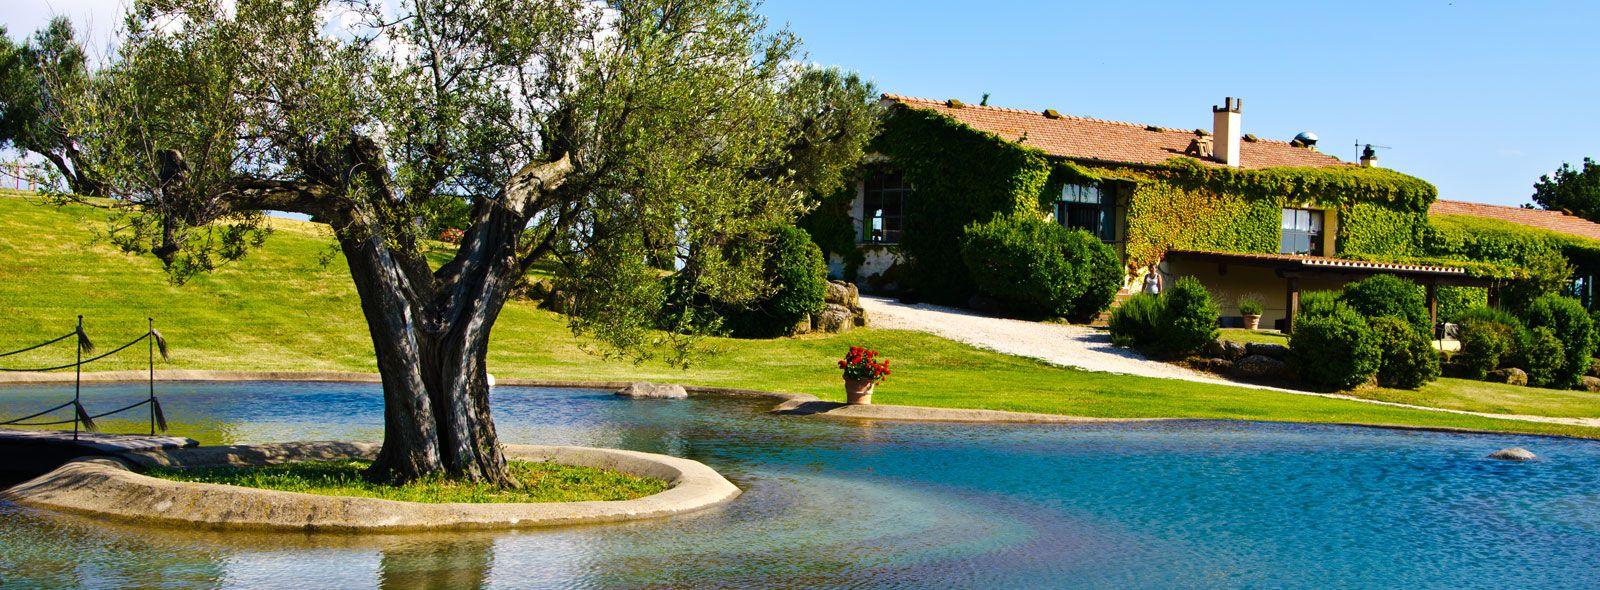 Agriturismo piscina lombardia trovami - Agriturismo piscina lombardia ...